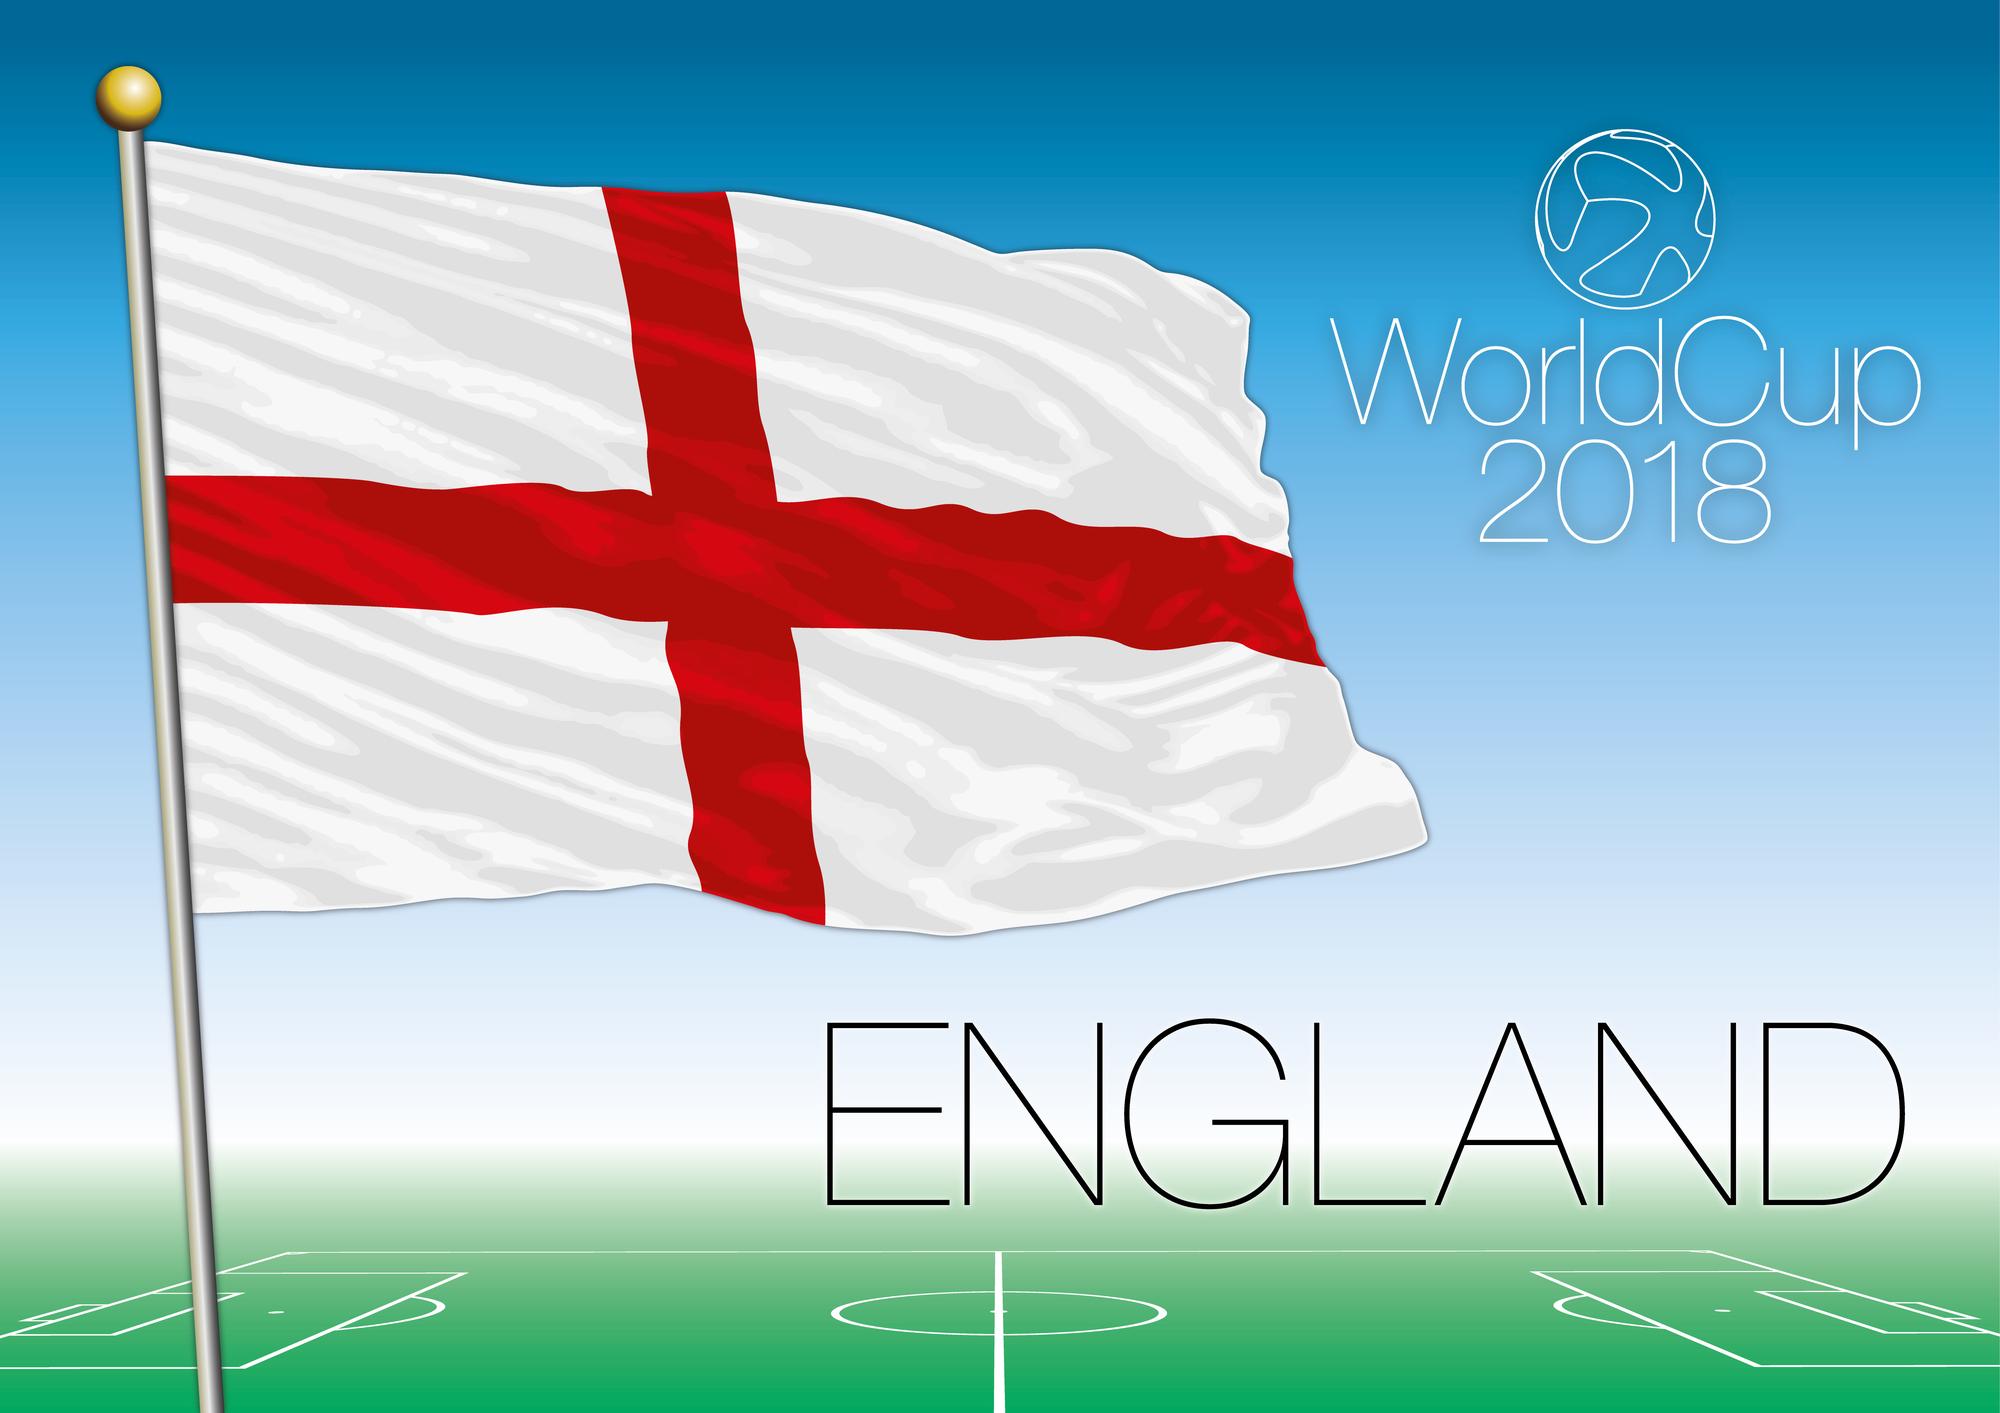 england-world-cup-2018